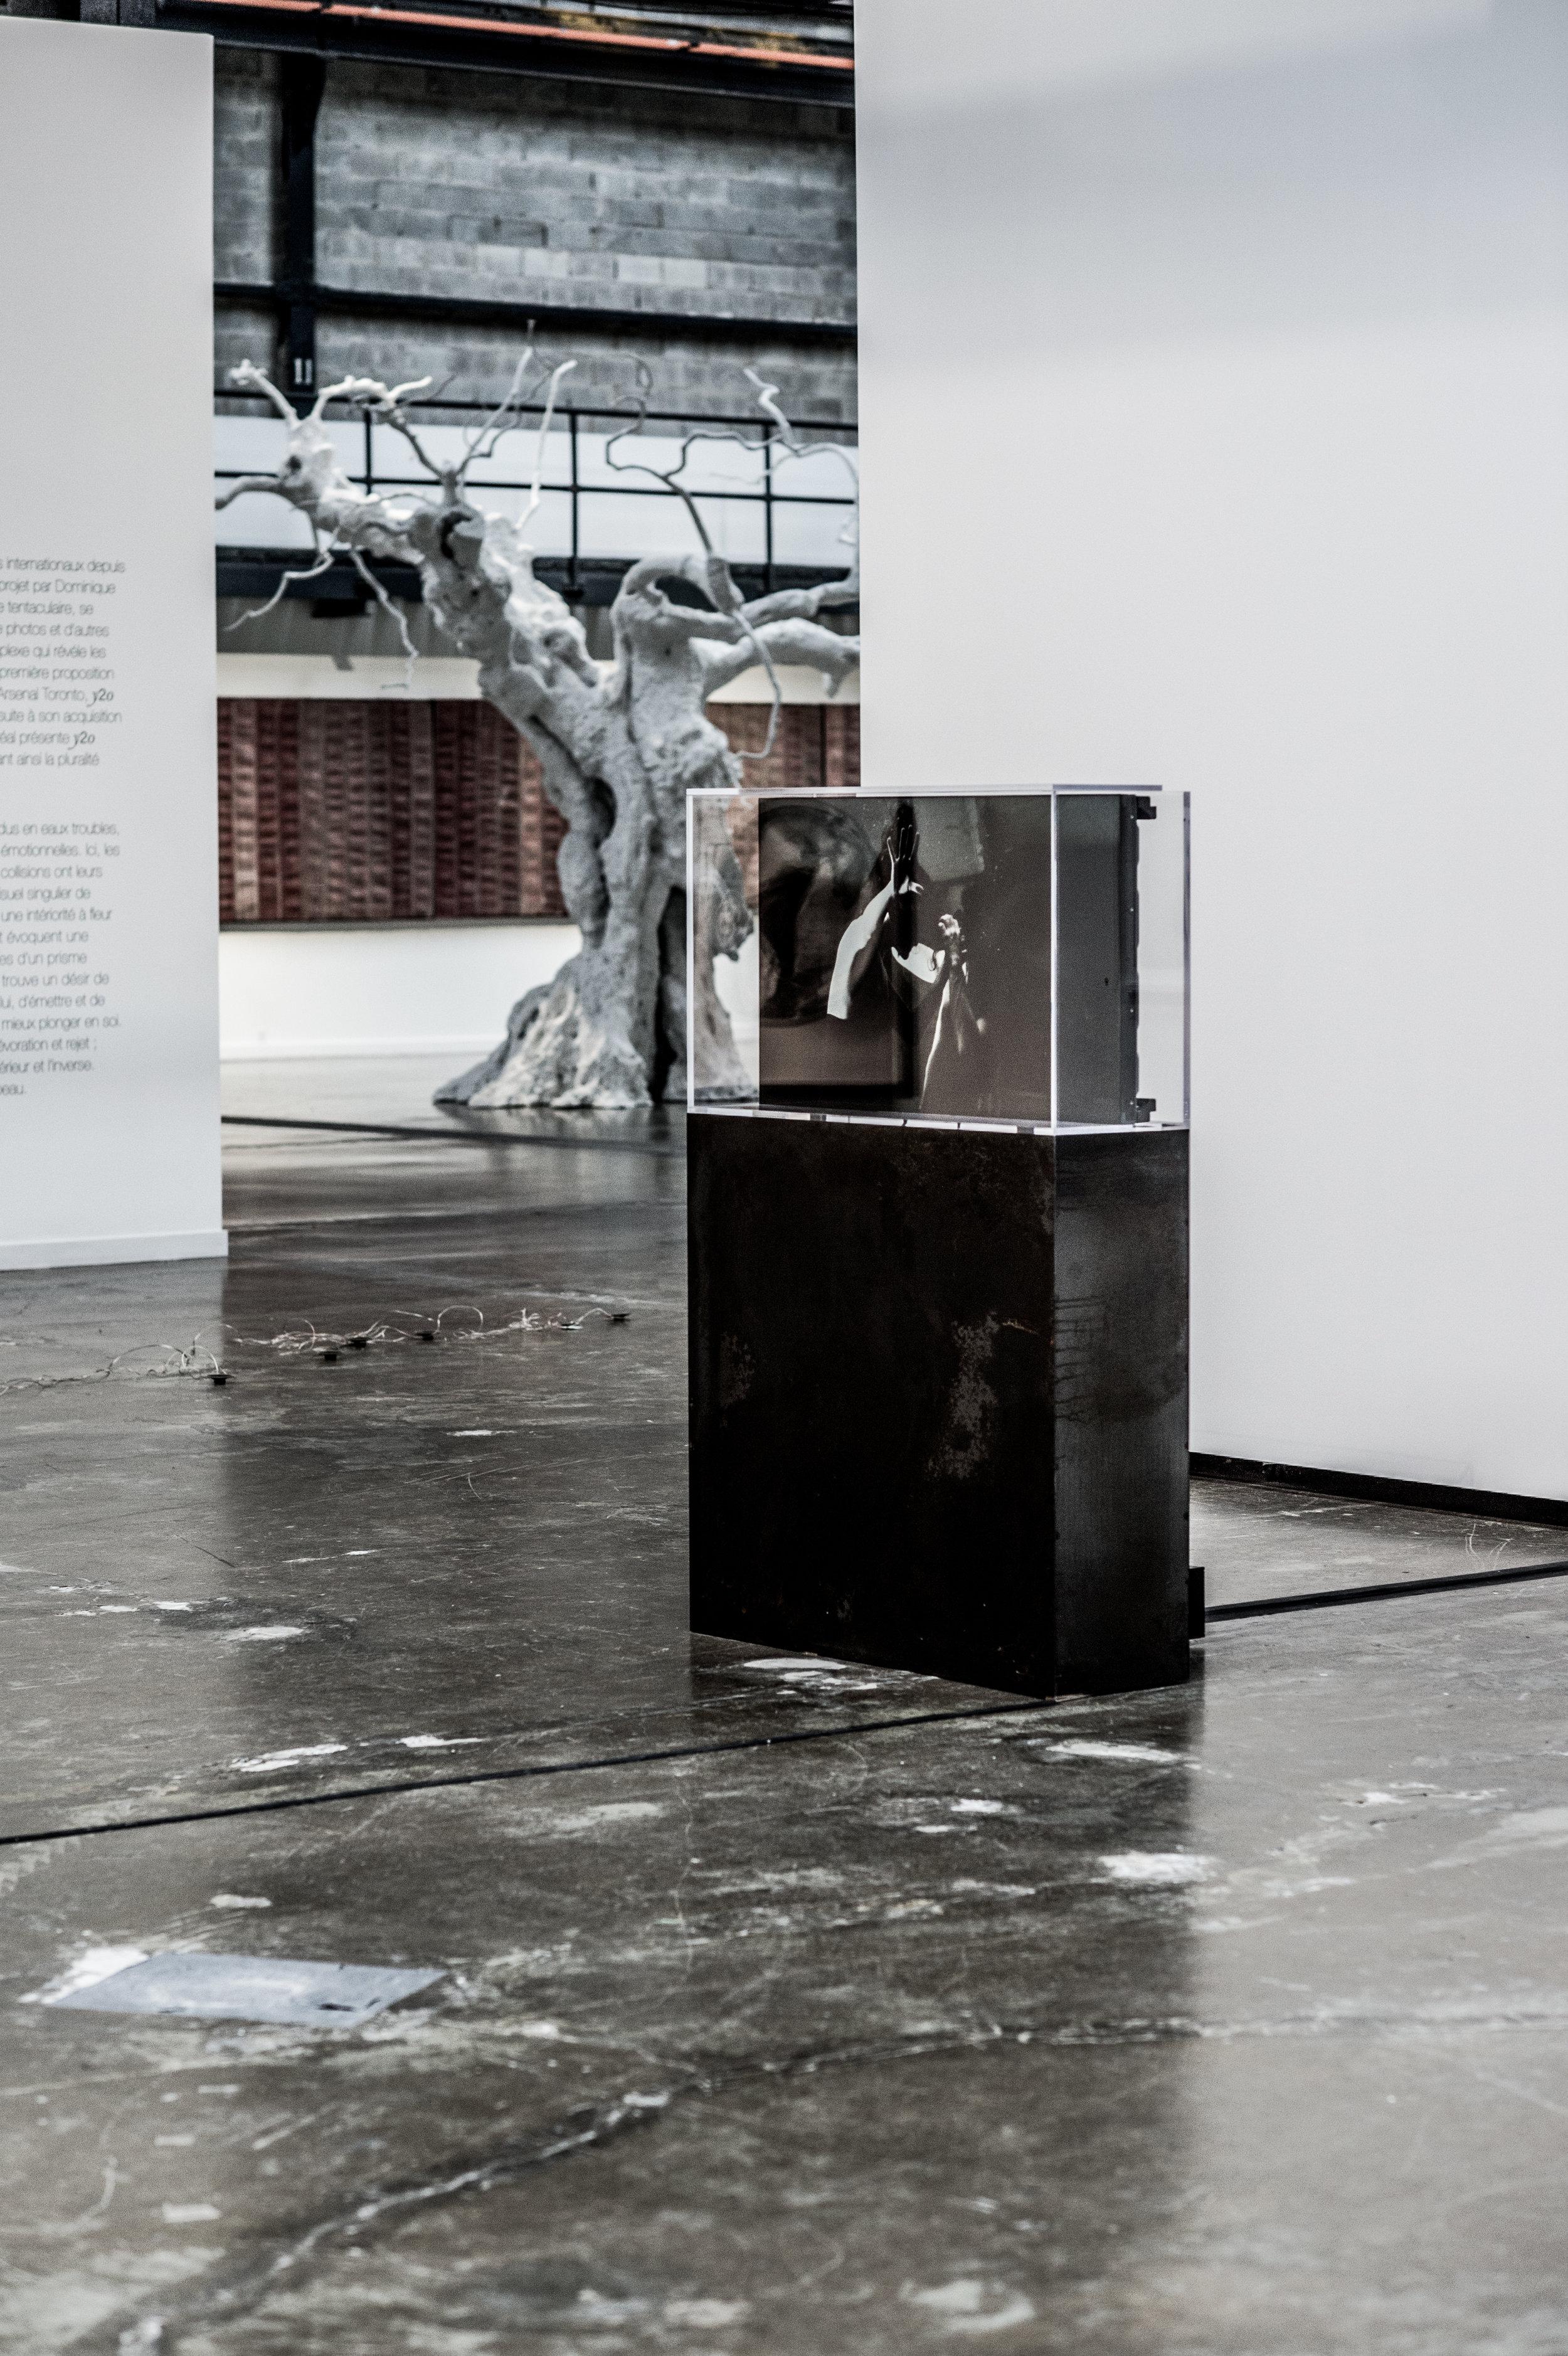 "y2o huis clos, 2015   Installation vidéo avec acier, acrylique, ordinateur et moniteur 162.5 x 106.7 x 32.4 cm (64"" x 42 ½"" x 12 ¾"") 2h 53 min 18 sec. Edition 1/2 Collection Majudia    © dominique t skoltz"